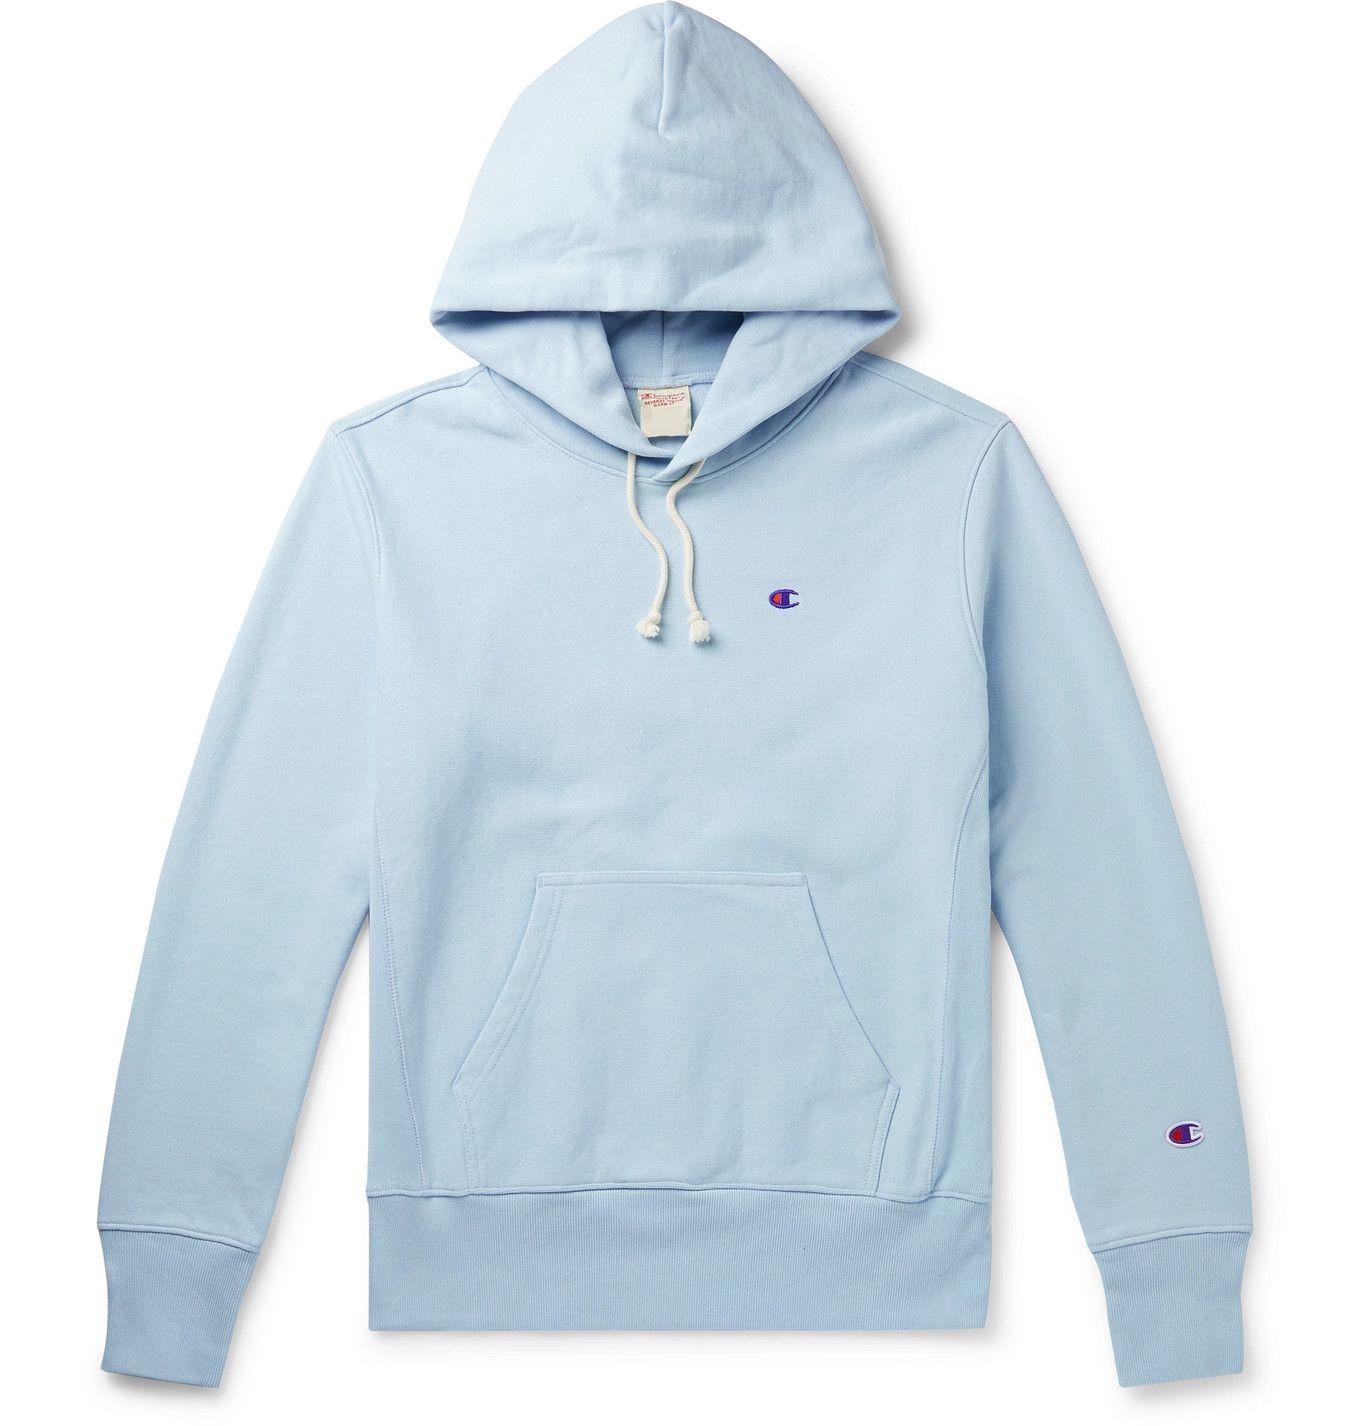 Champion Logo Embroidered Melange Fleece Back Cotton Blend Jersey Hoodie Men Blue Hoodies Champion Sportswear Blue Champion Hoodie [ 1426 x 1365 Pixel ]